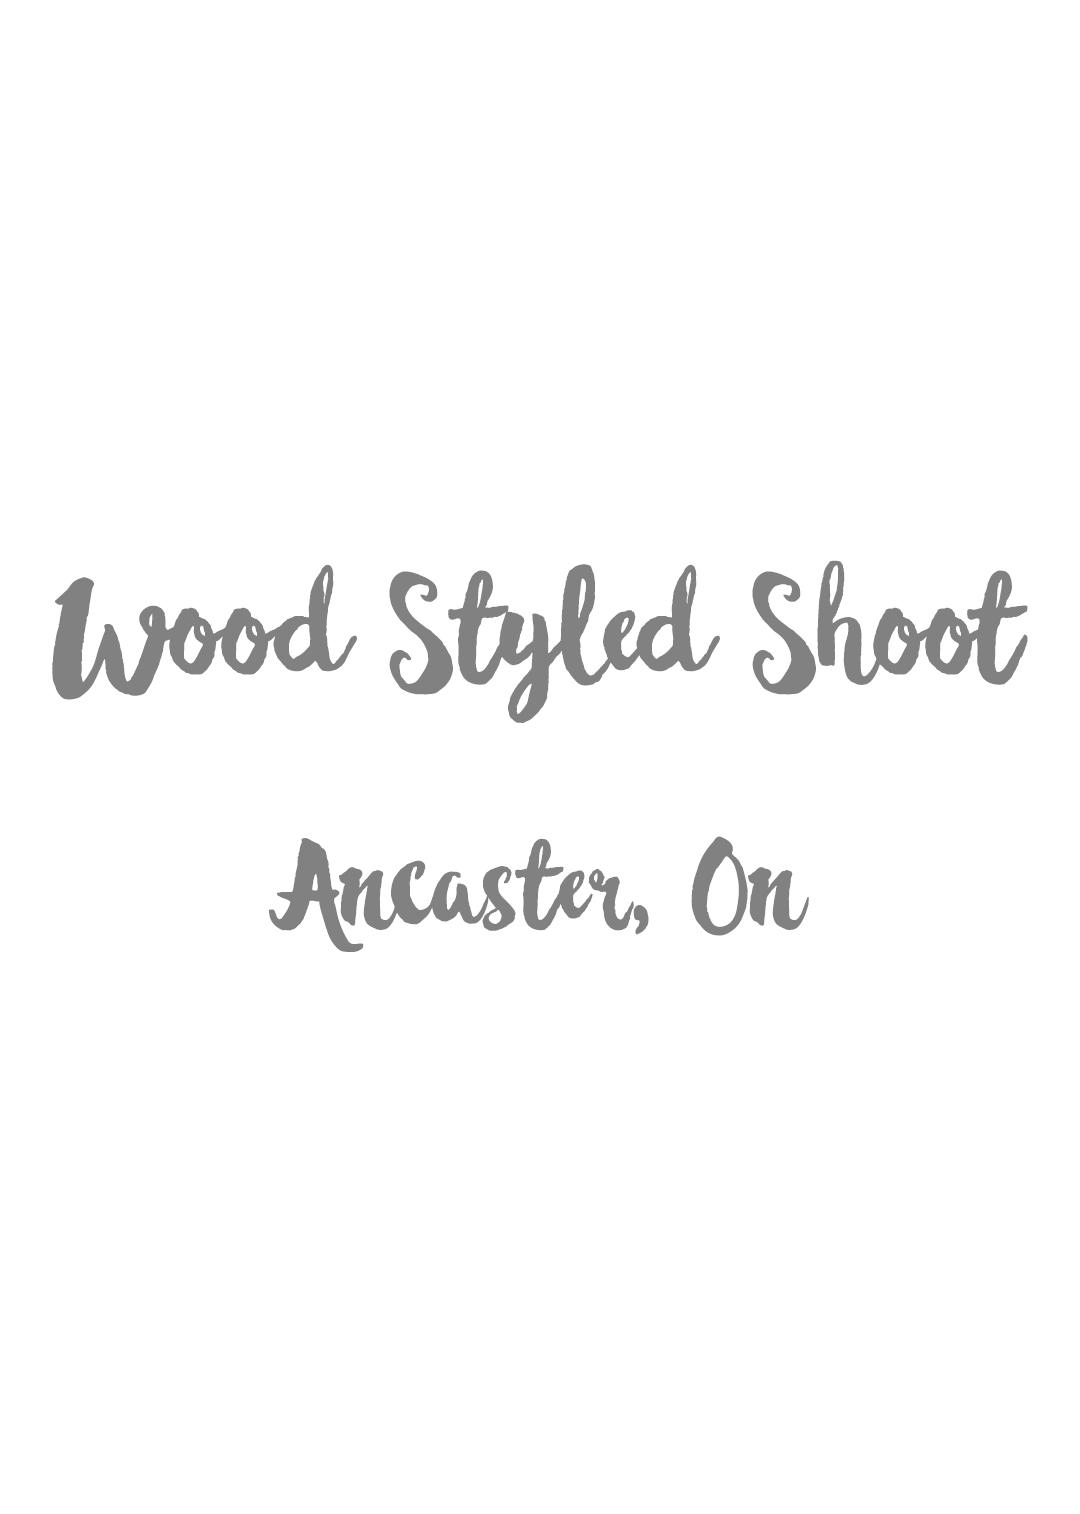 Wood shoot title.jpg